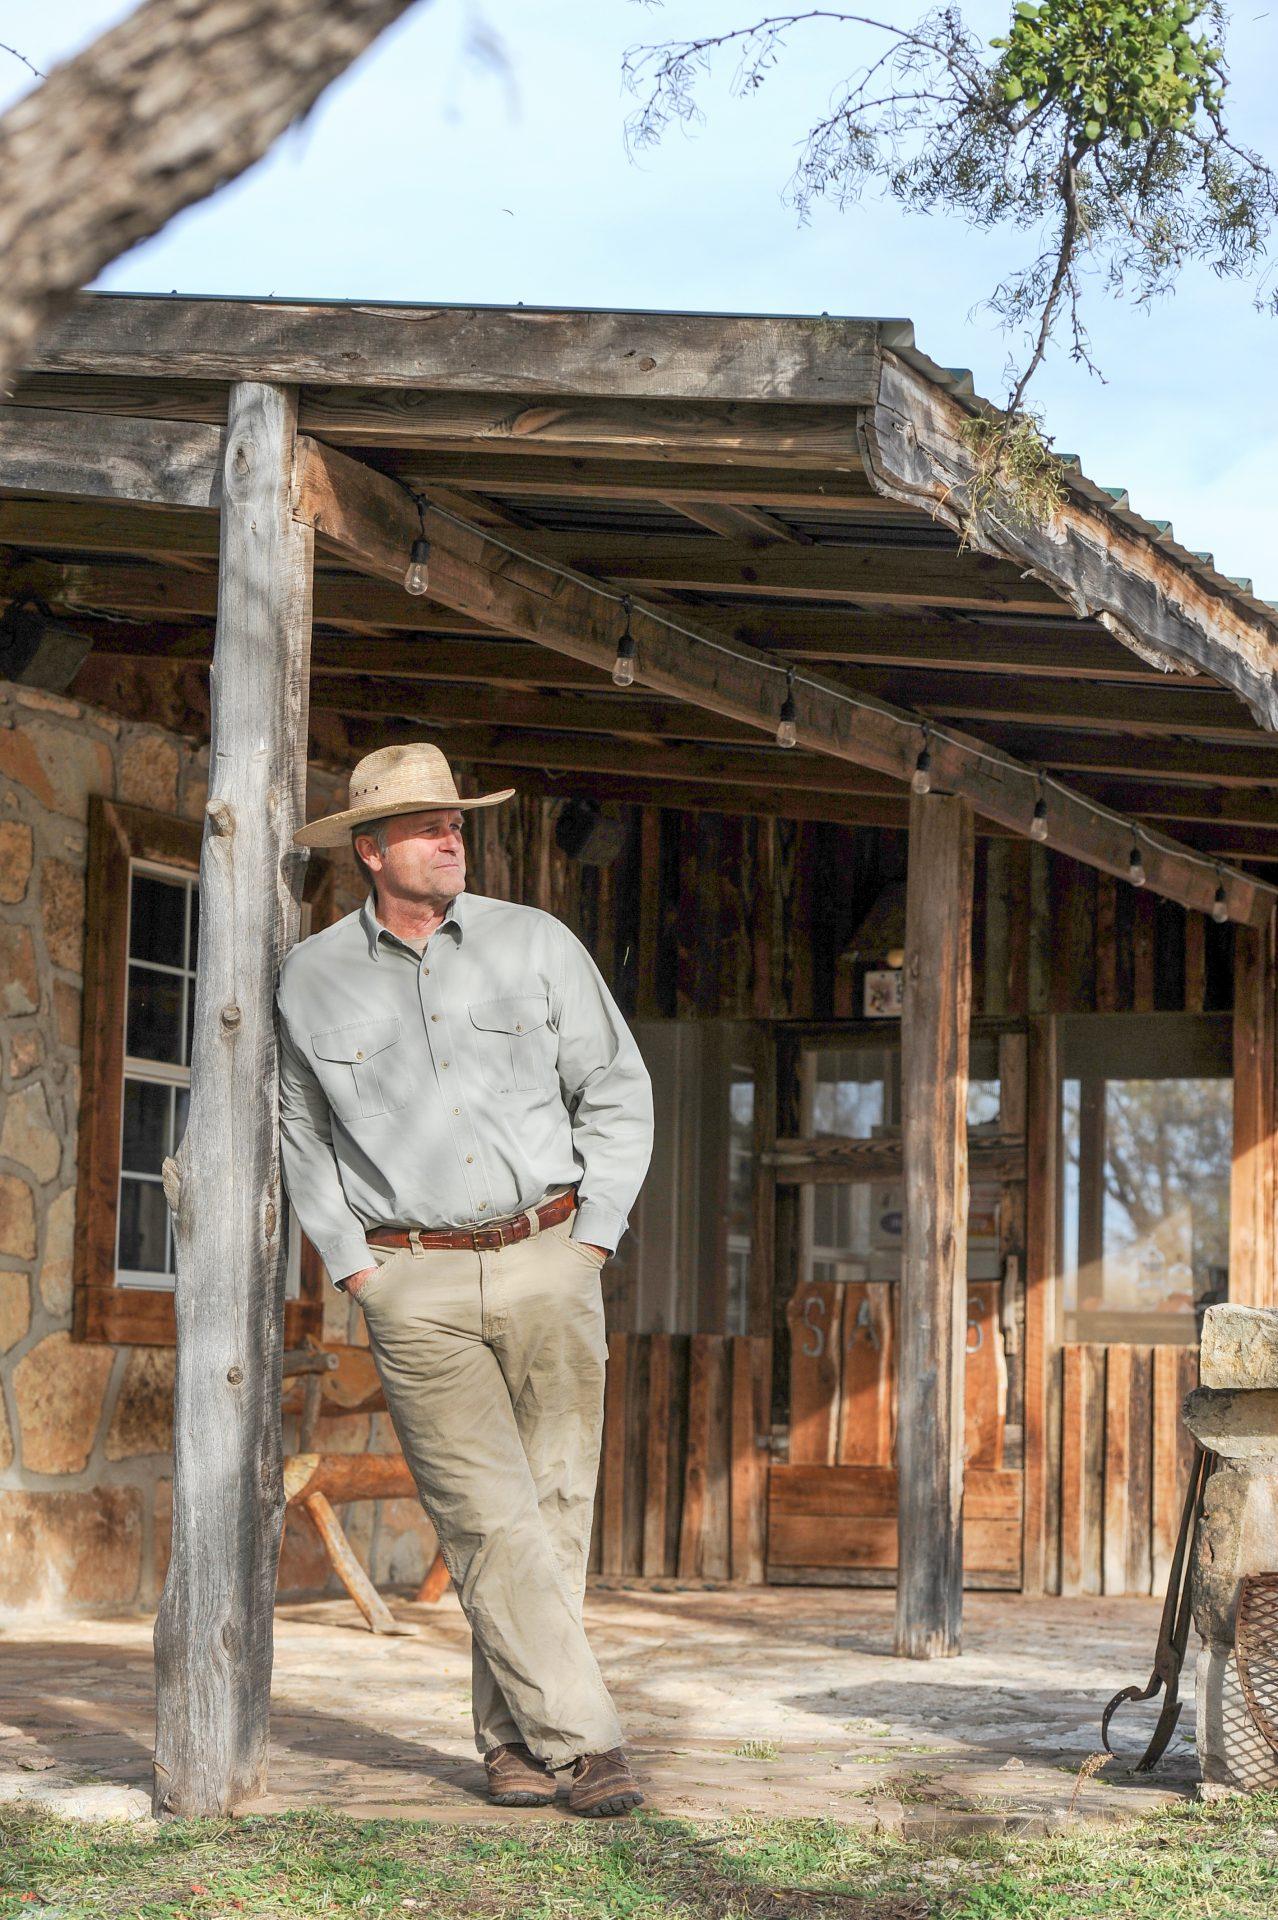 David Sams, owner of Lone Star Outdoor News.